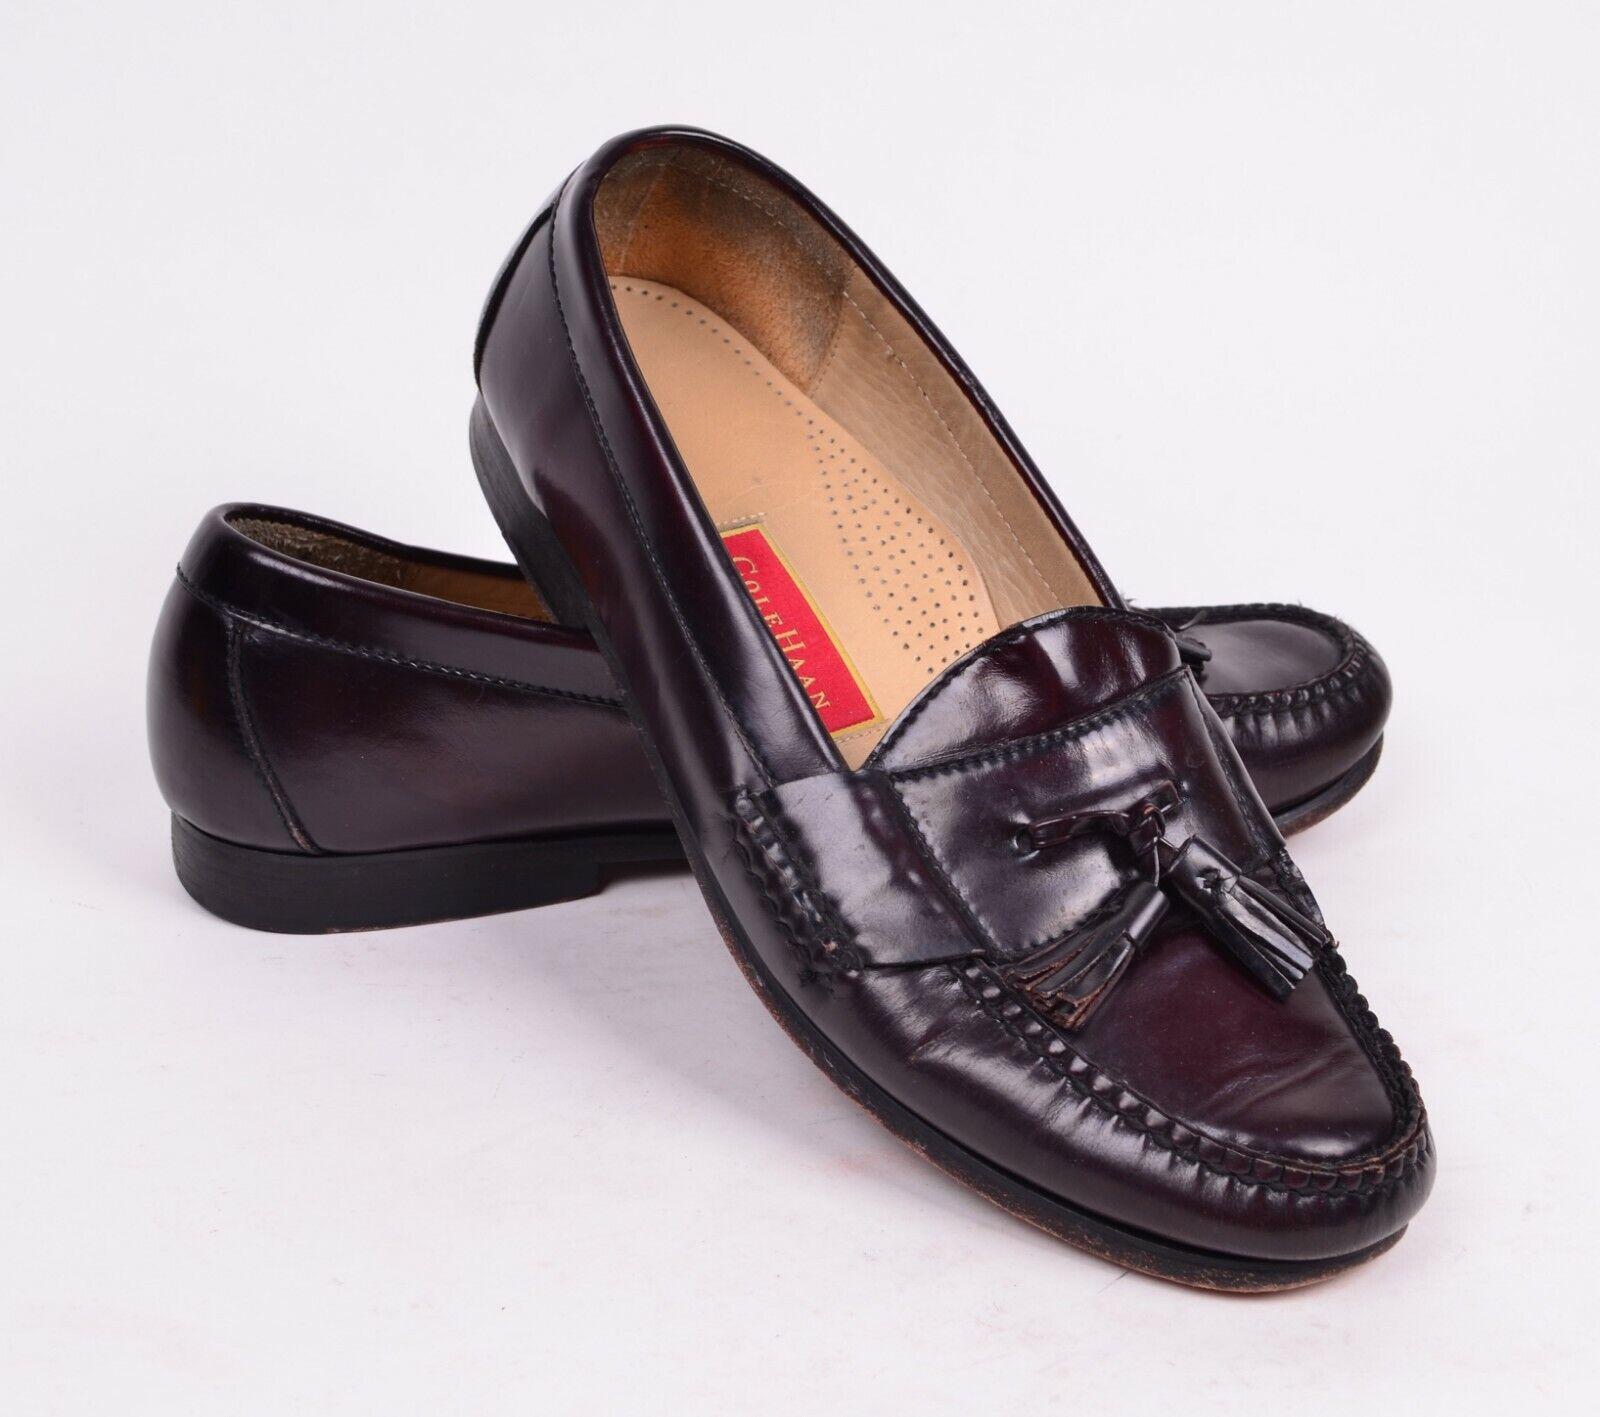 Cole Haan Men's 11 D Brown Leather Tassel Slip On Loafers 77623